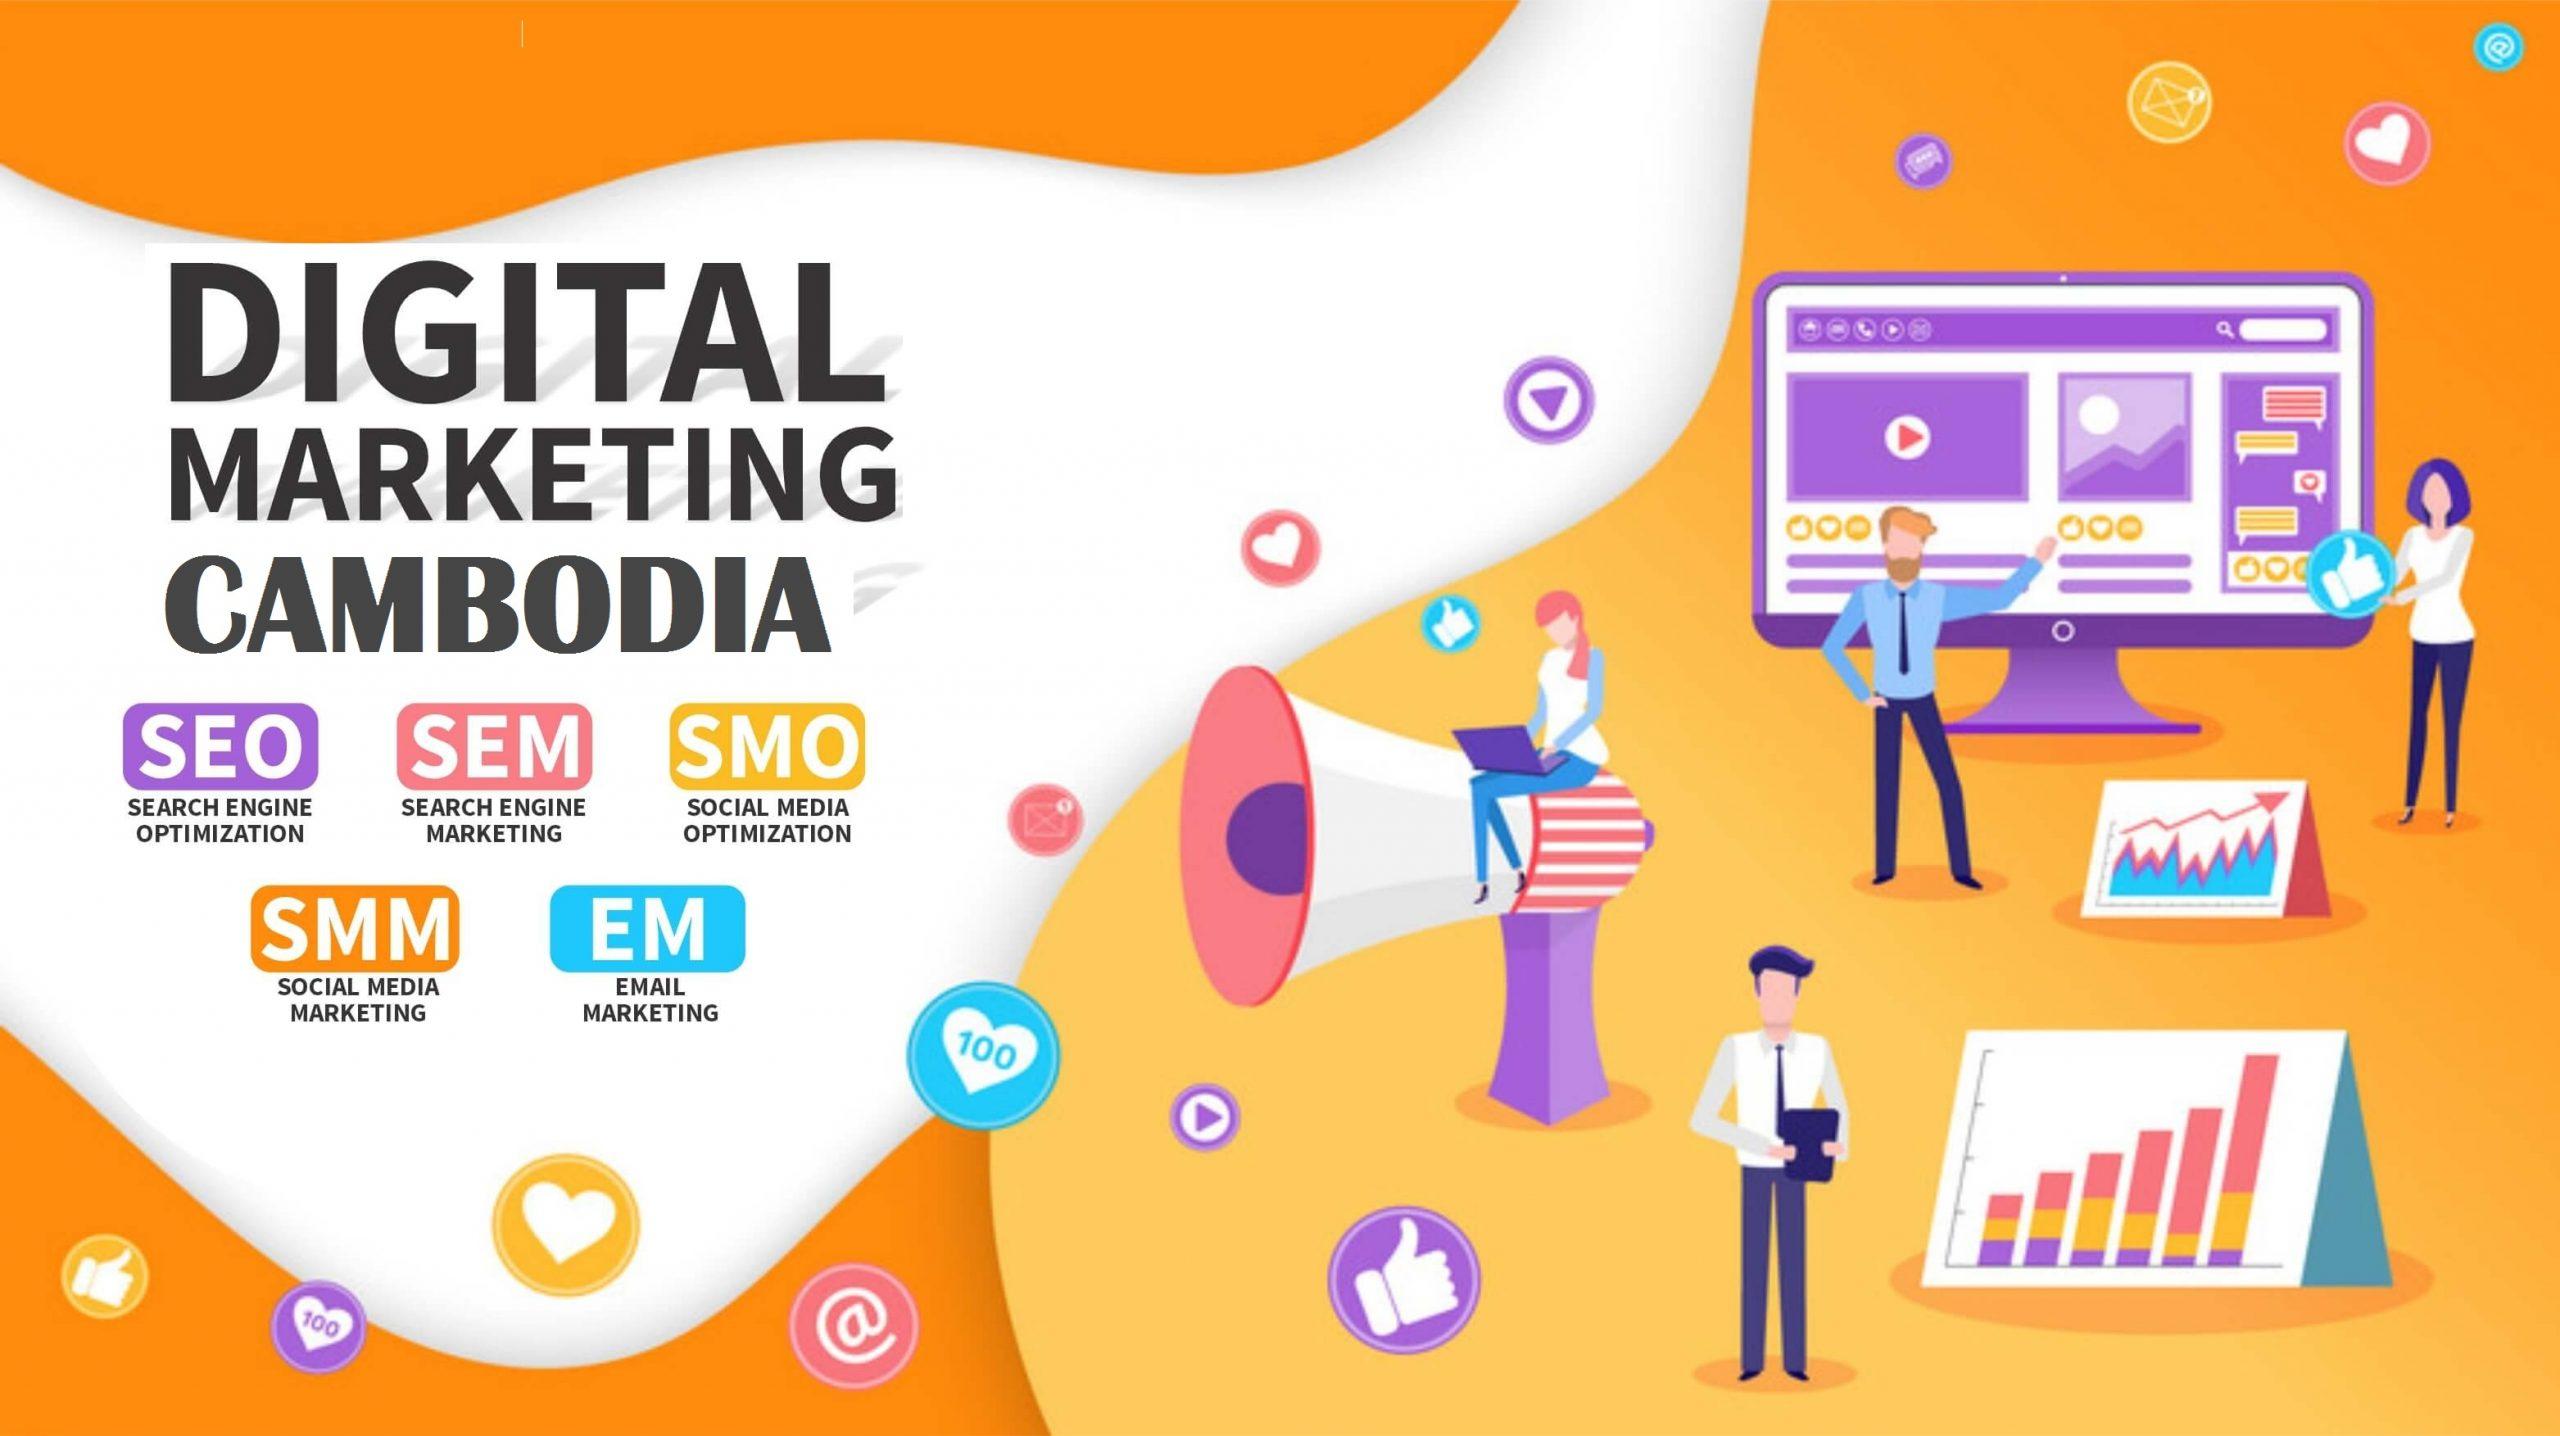 Digital Marketing Cambodia 2020